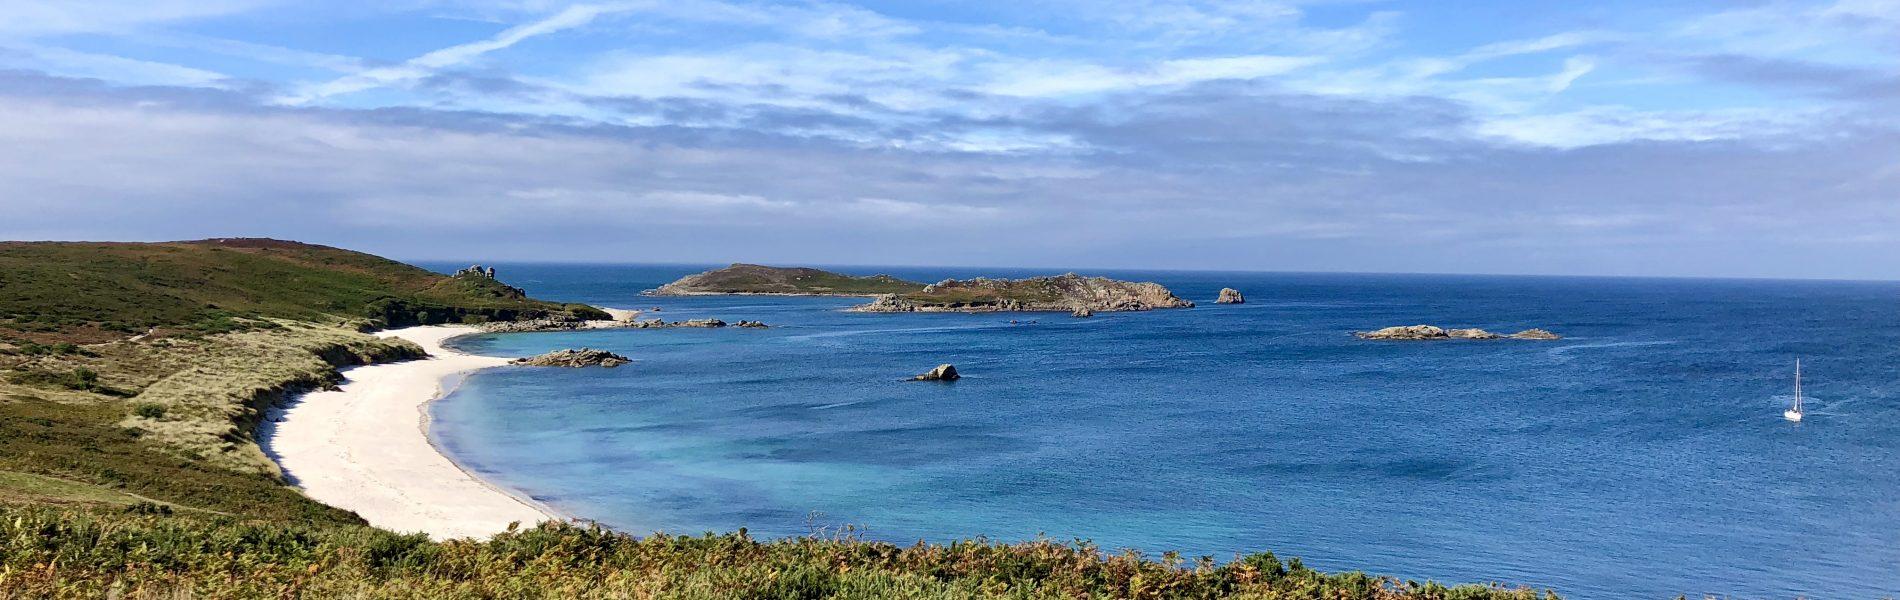 Great Bay, St Martin's